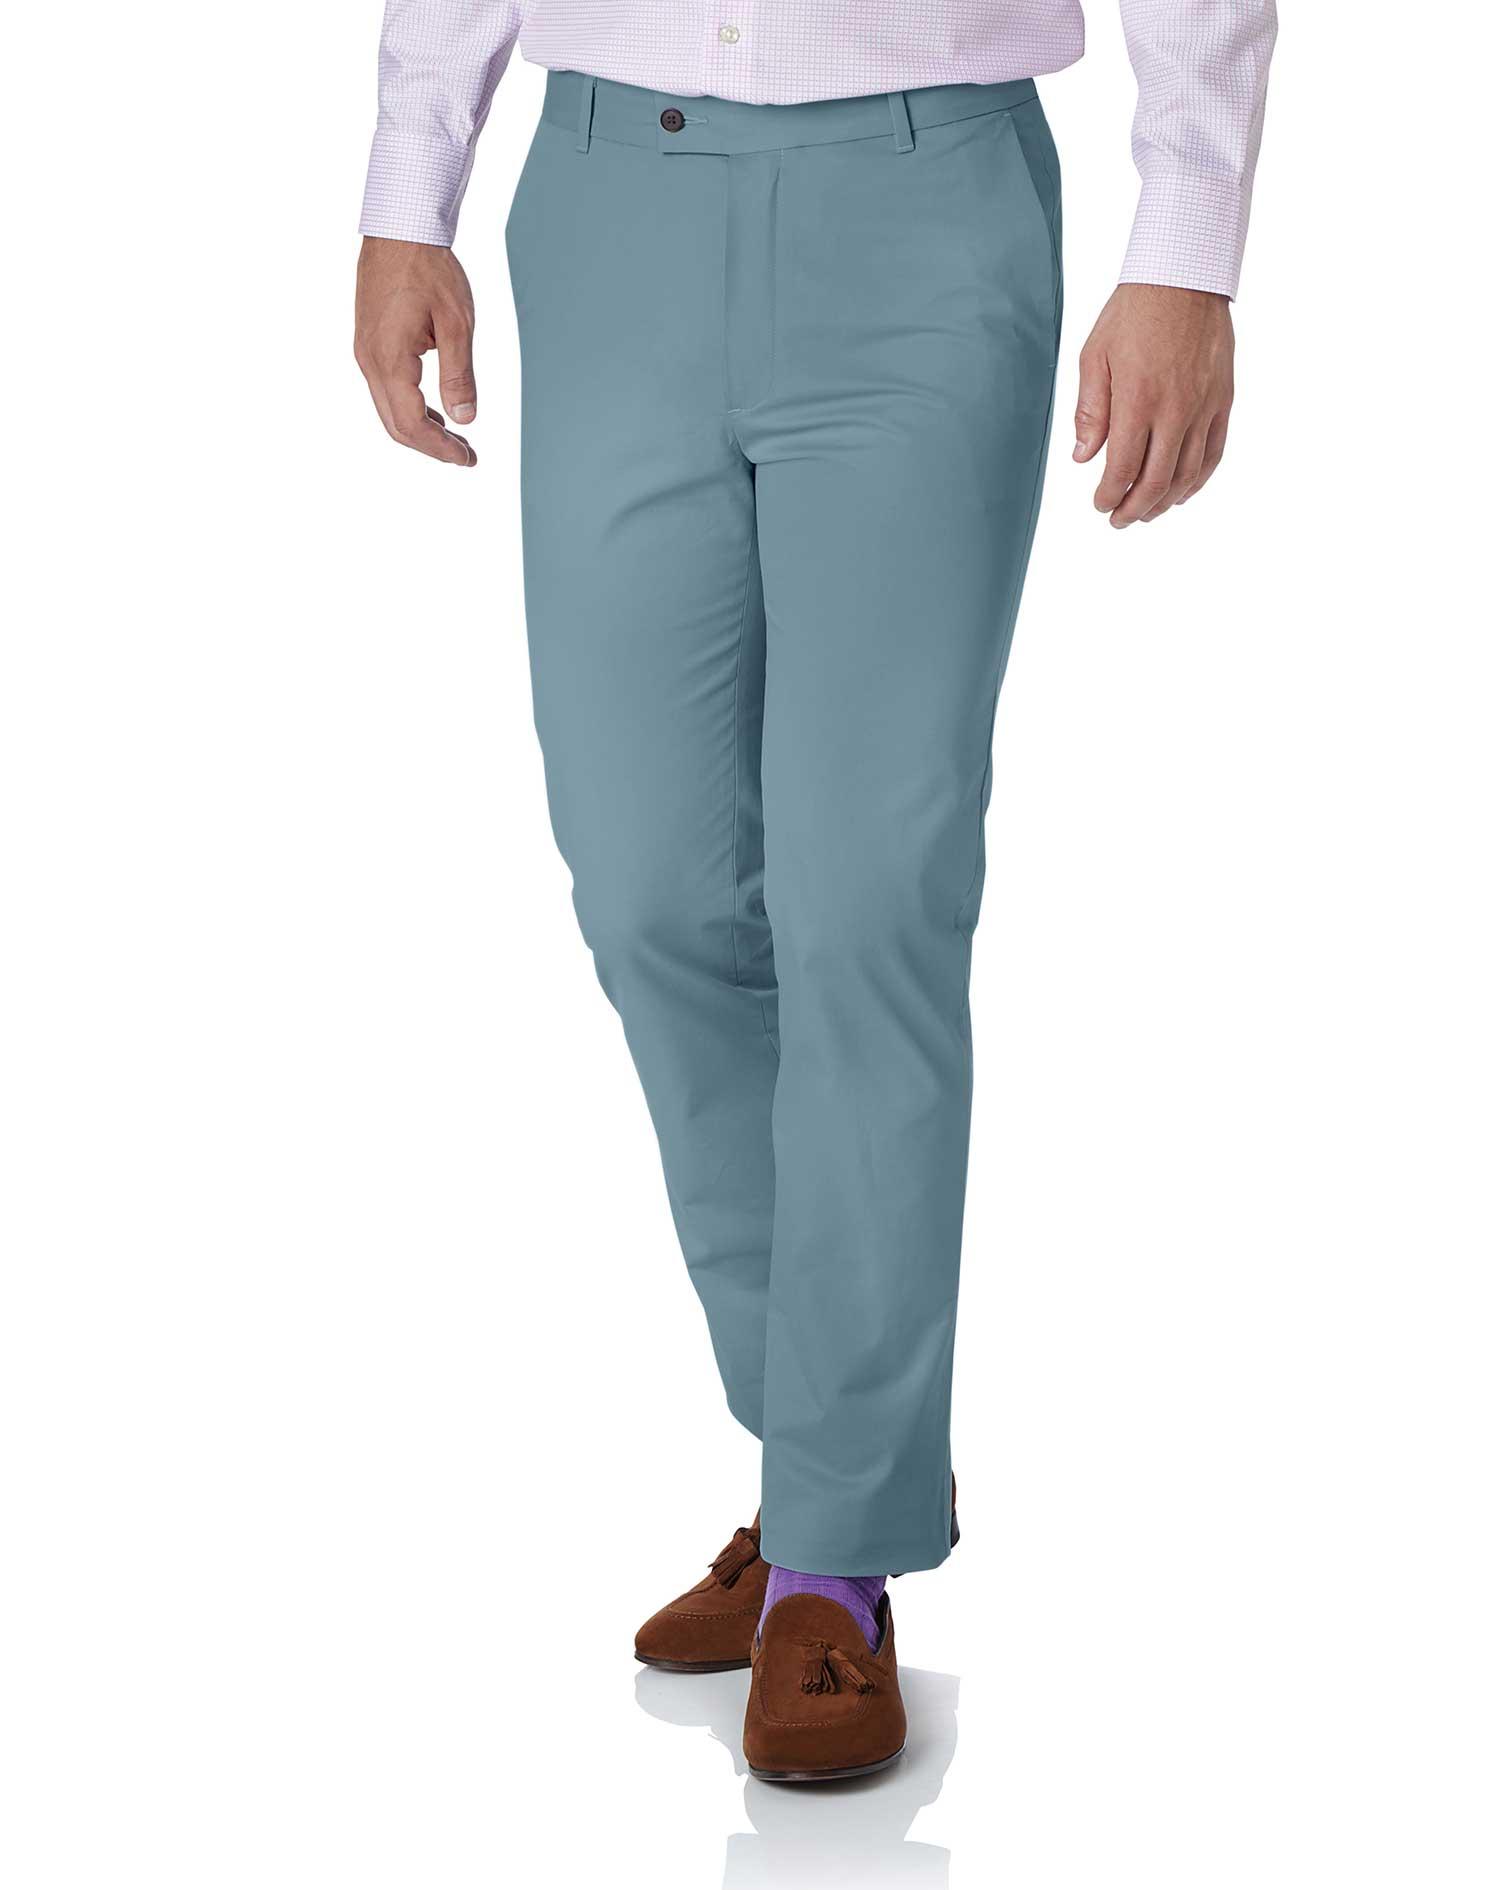 Sky Blue Slim Fit Stretch Cotton Chino Pants Size W102 L86 by Charles Tyrwhitt